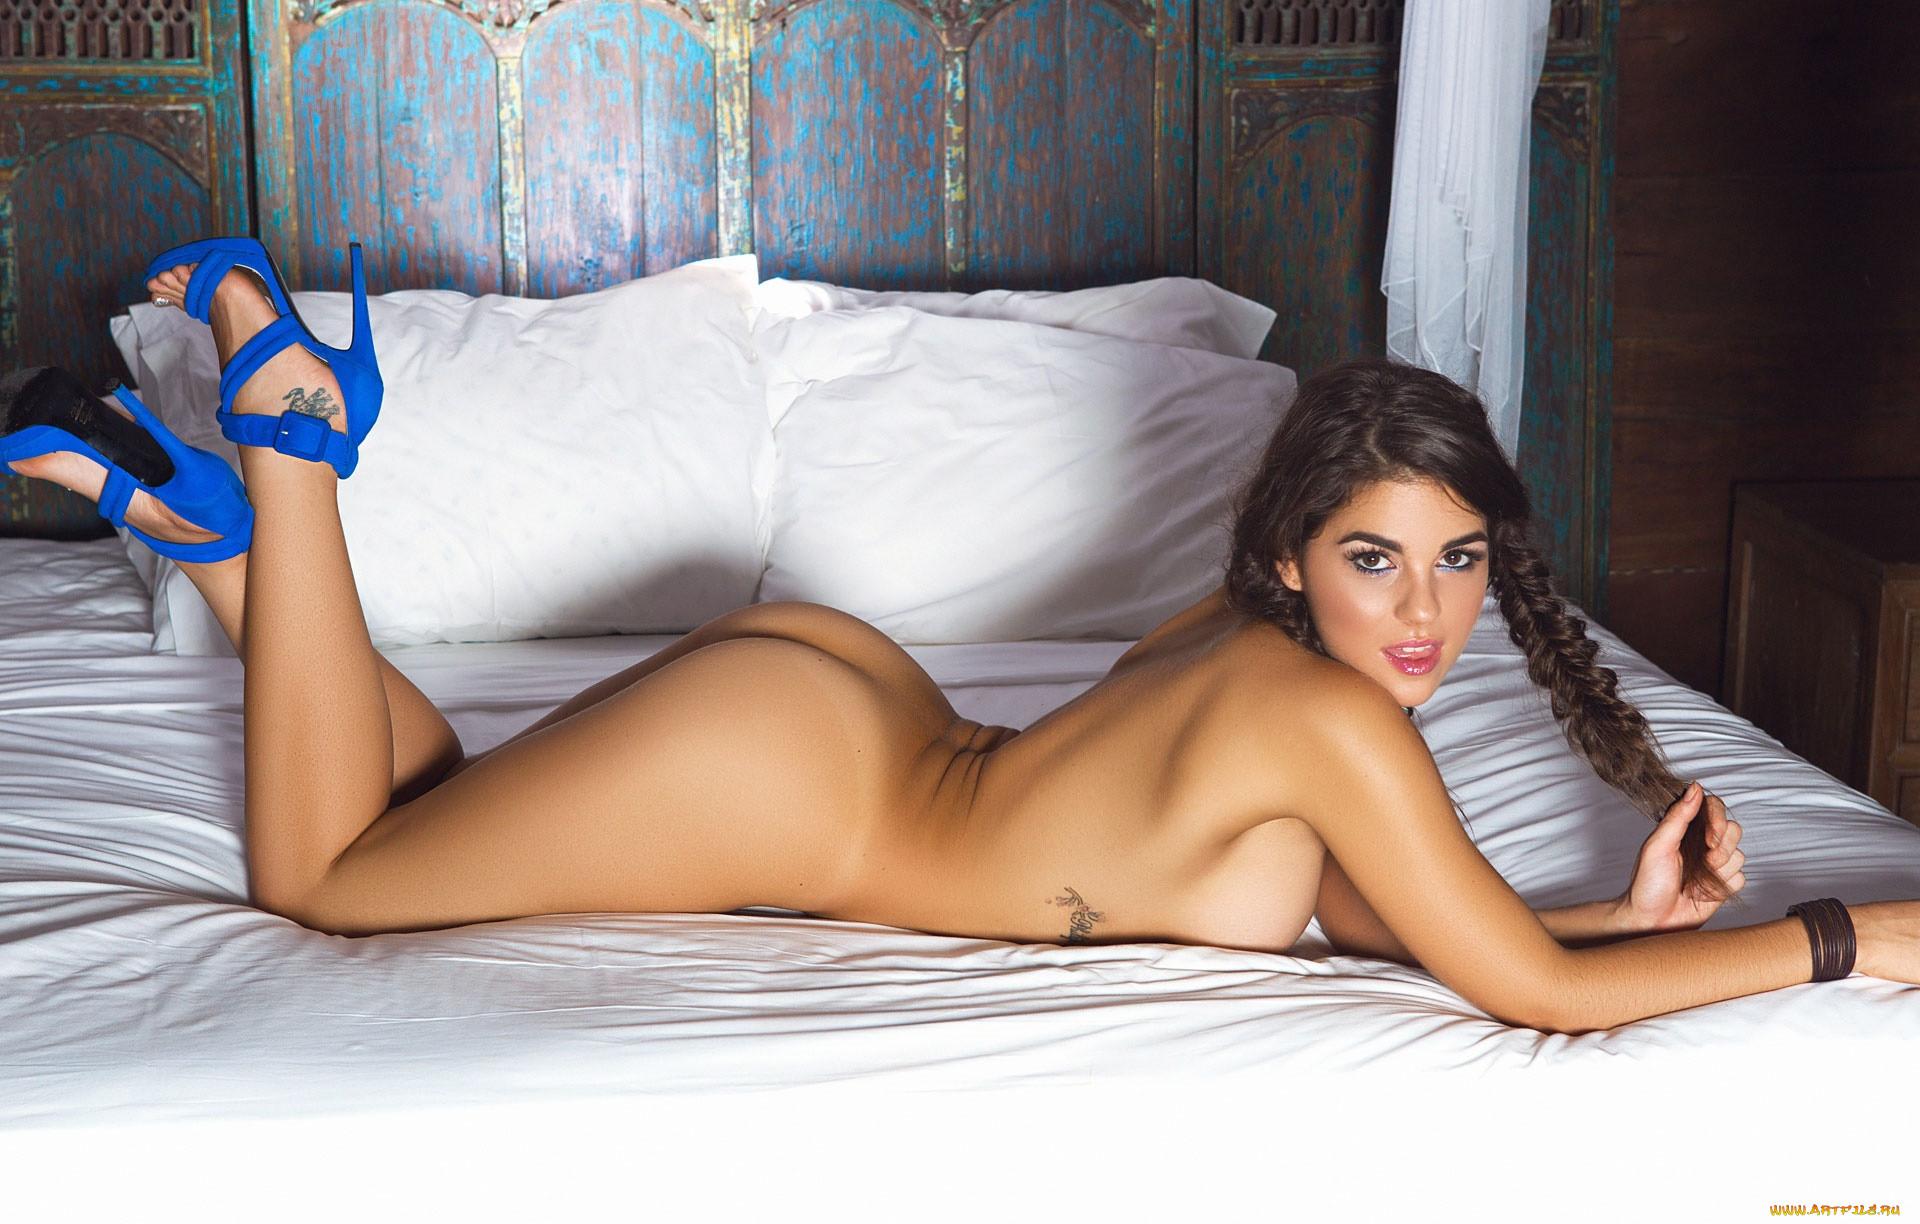 Jessica ann topless photoset